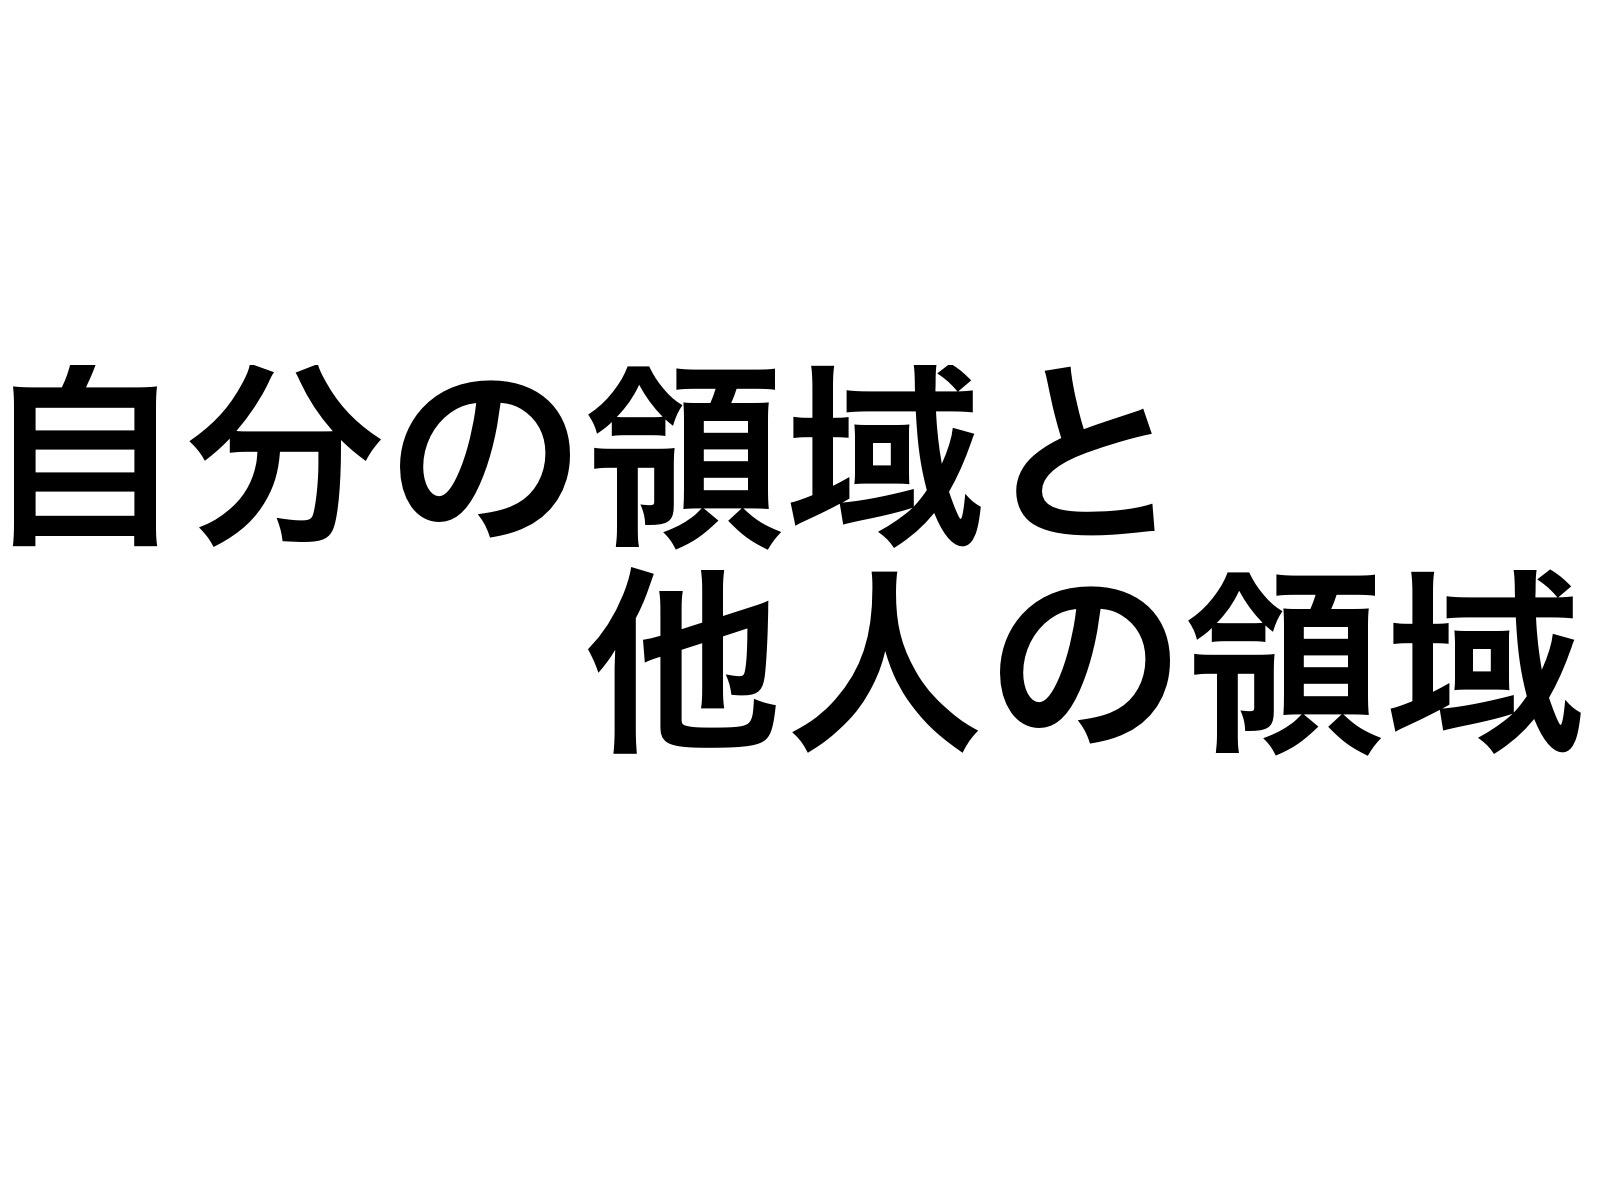 2016 07 30 20 50 30